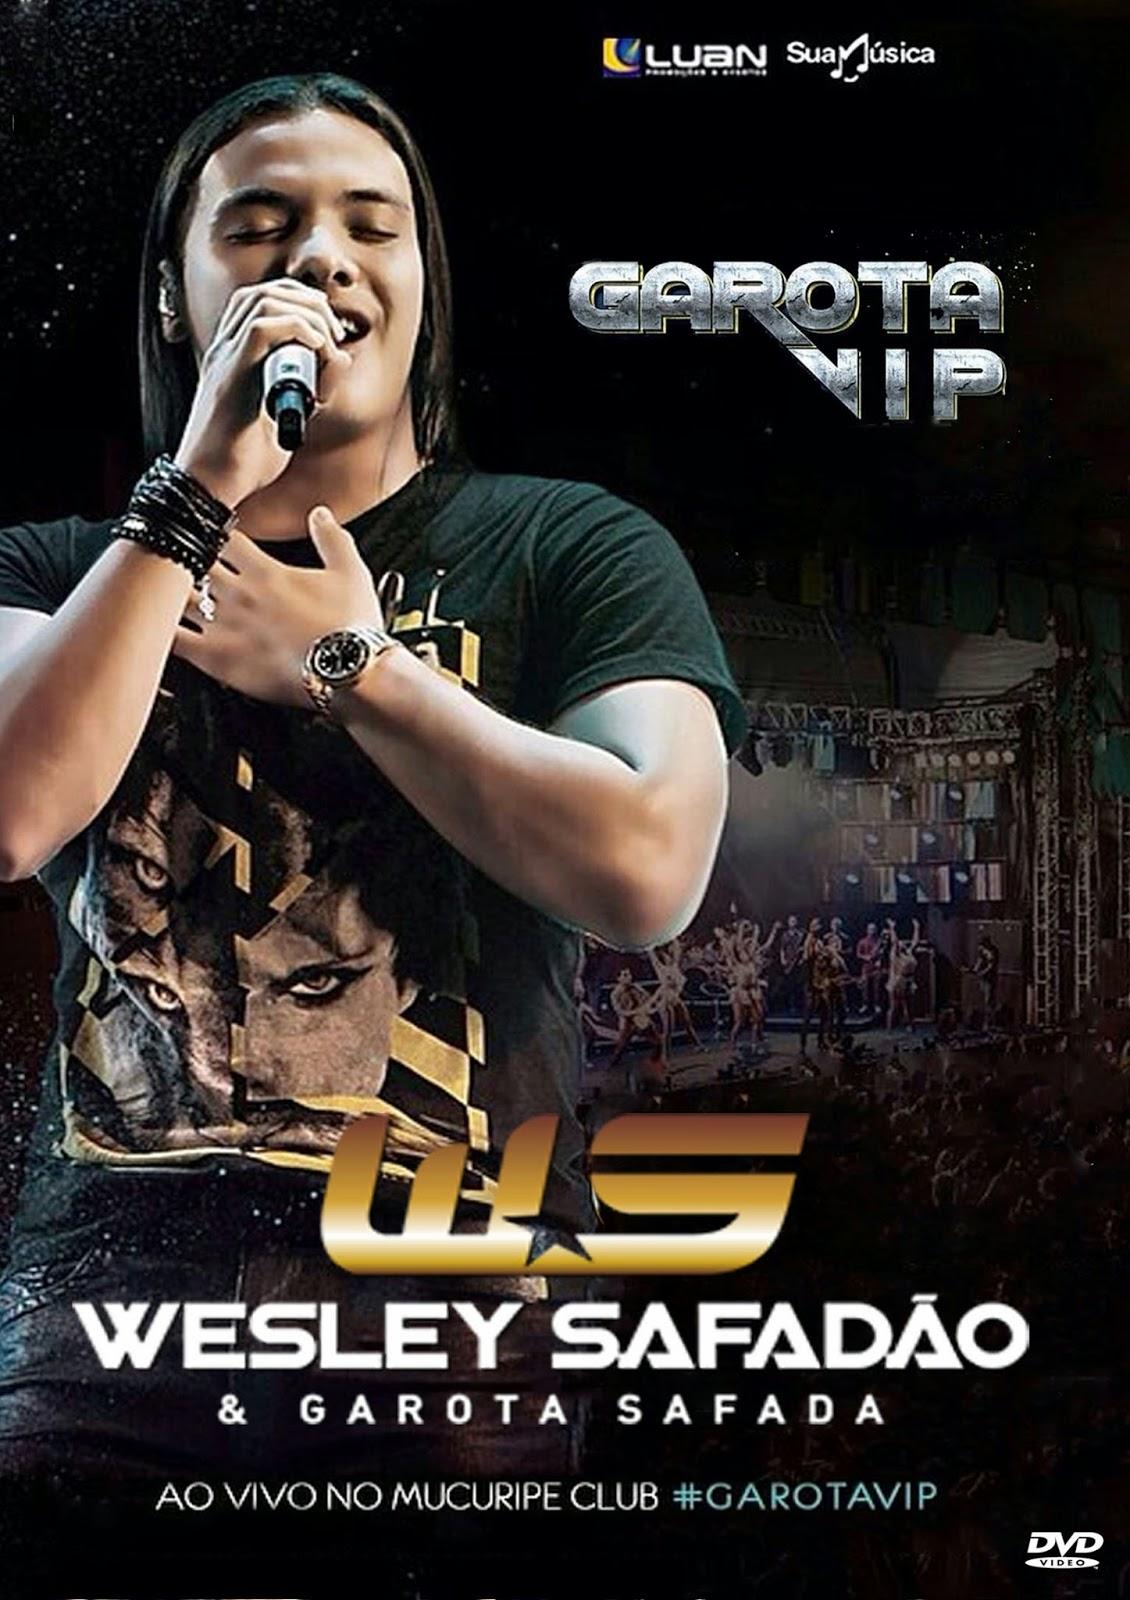 Download Wesley Safadão & Garota Safada Garota Vip DVDRip AVI + RMV